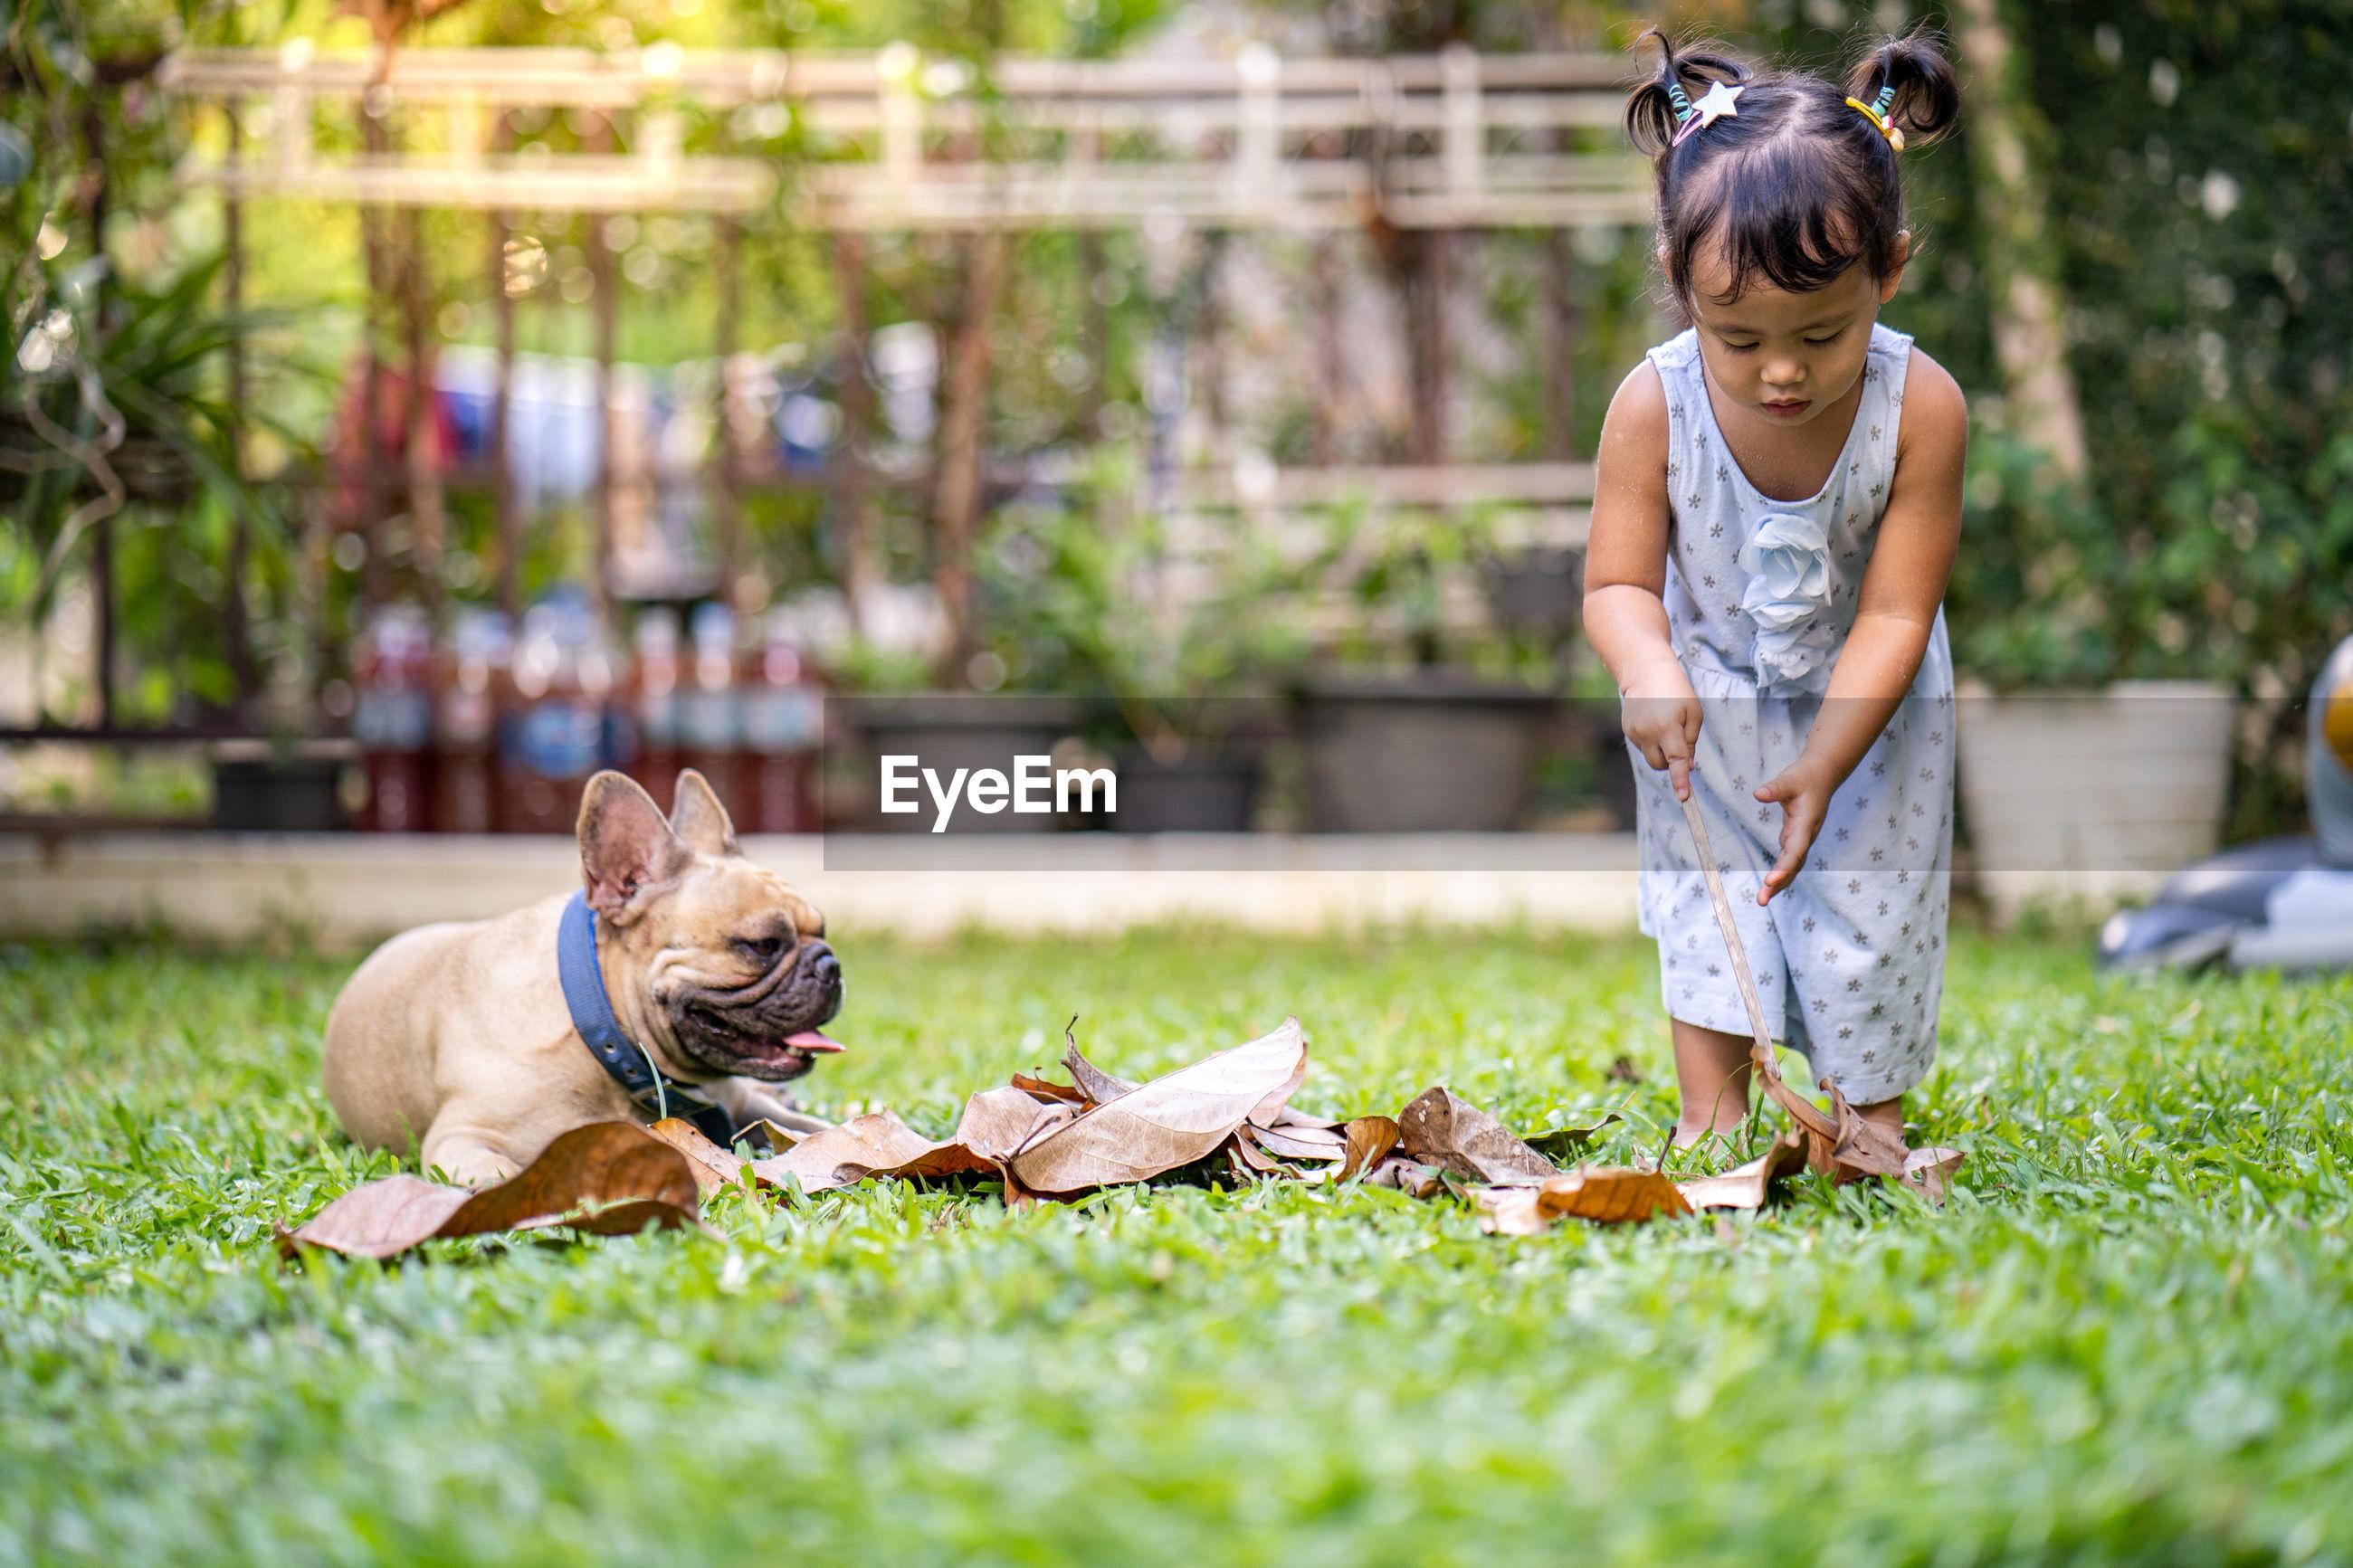 Full length of girl holding stick on grass by dog